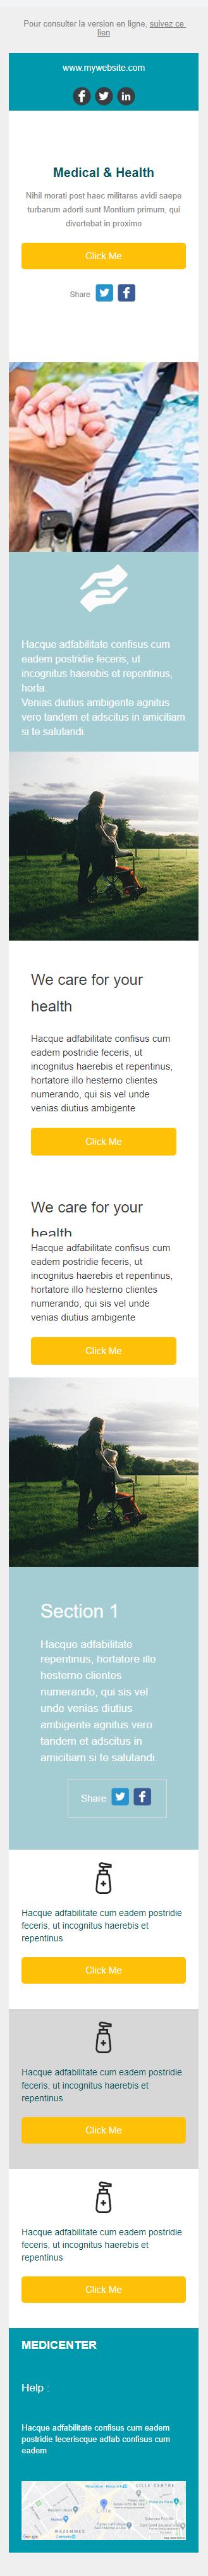 Templates Emailing MediCenter Sarbacane